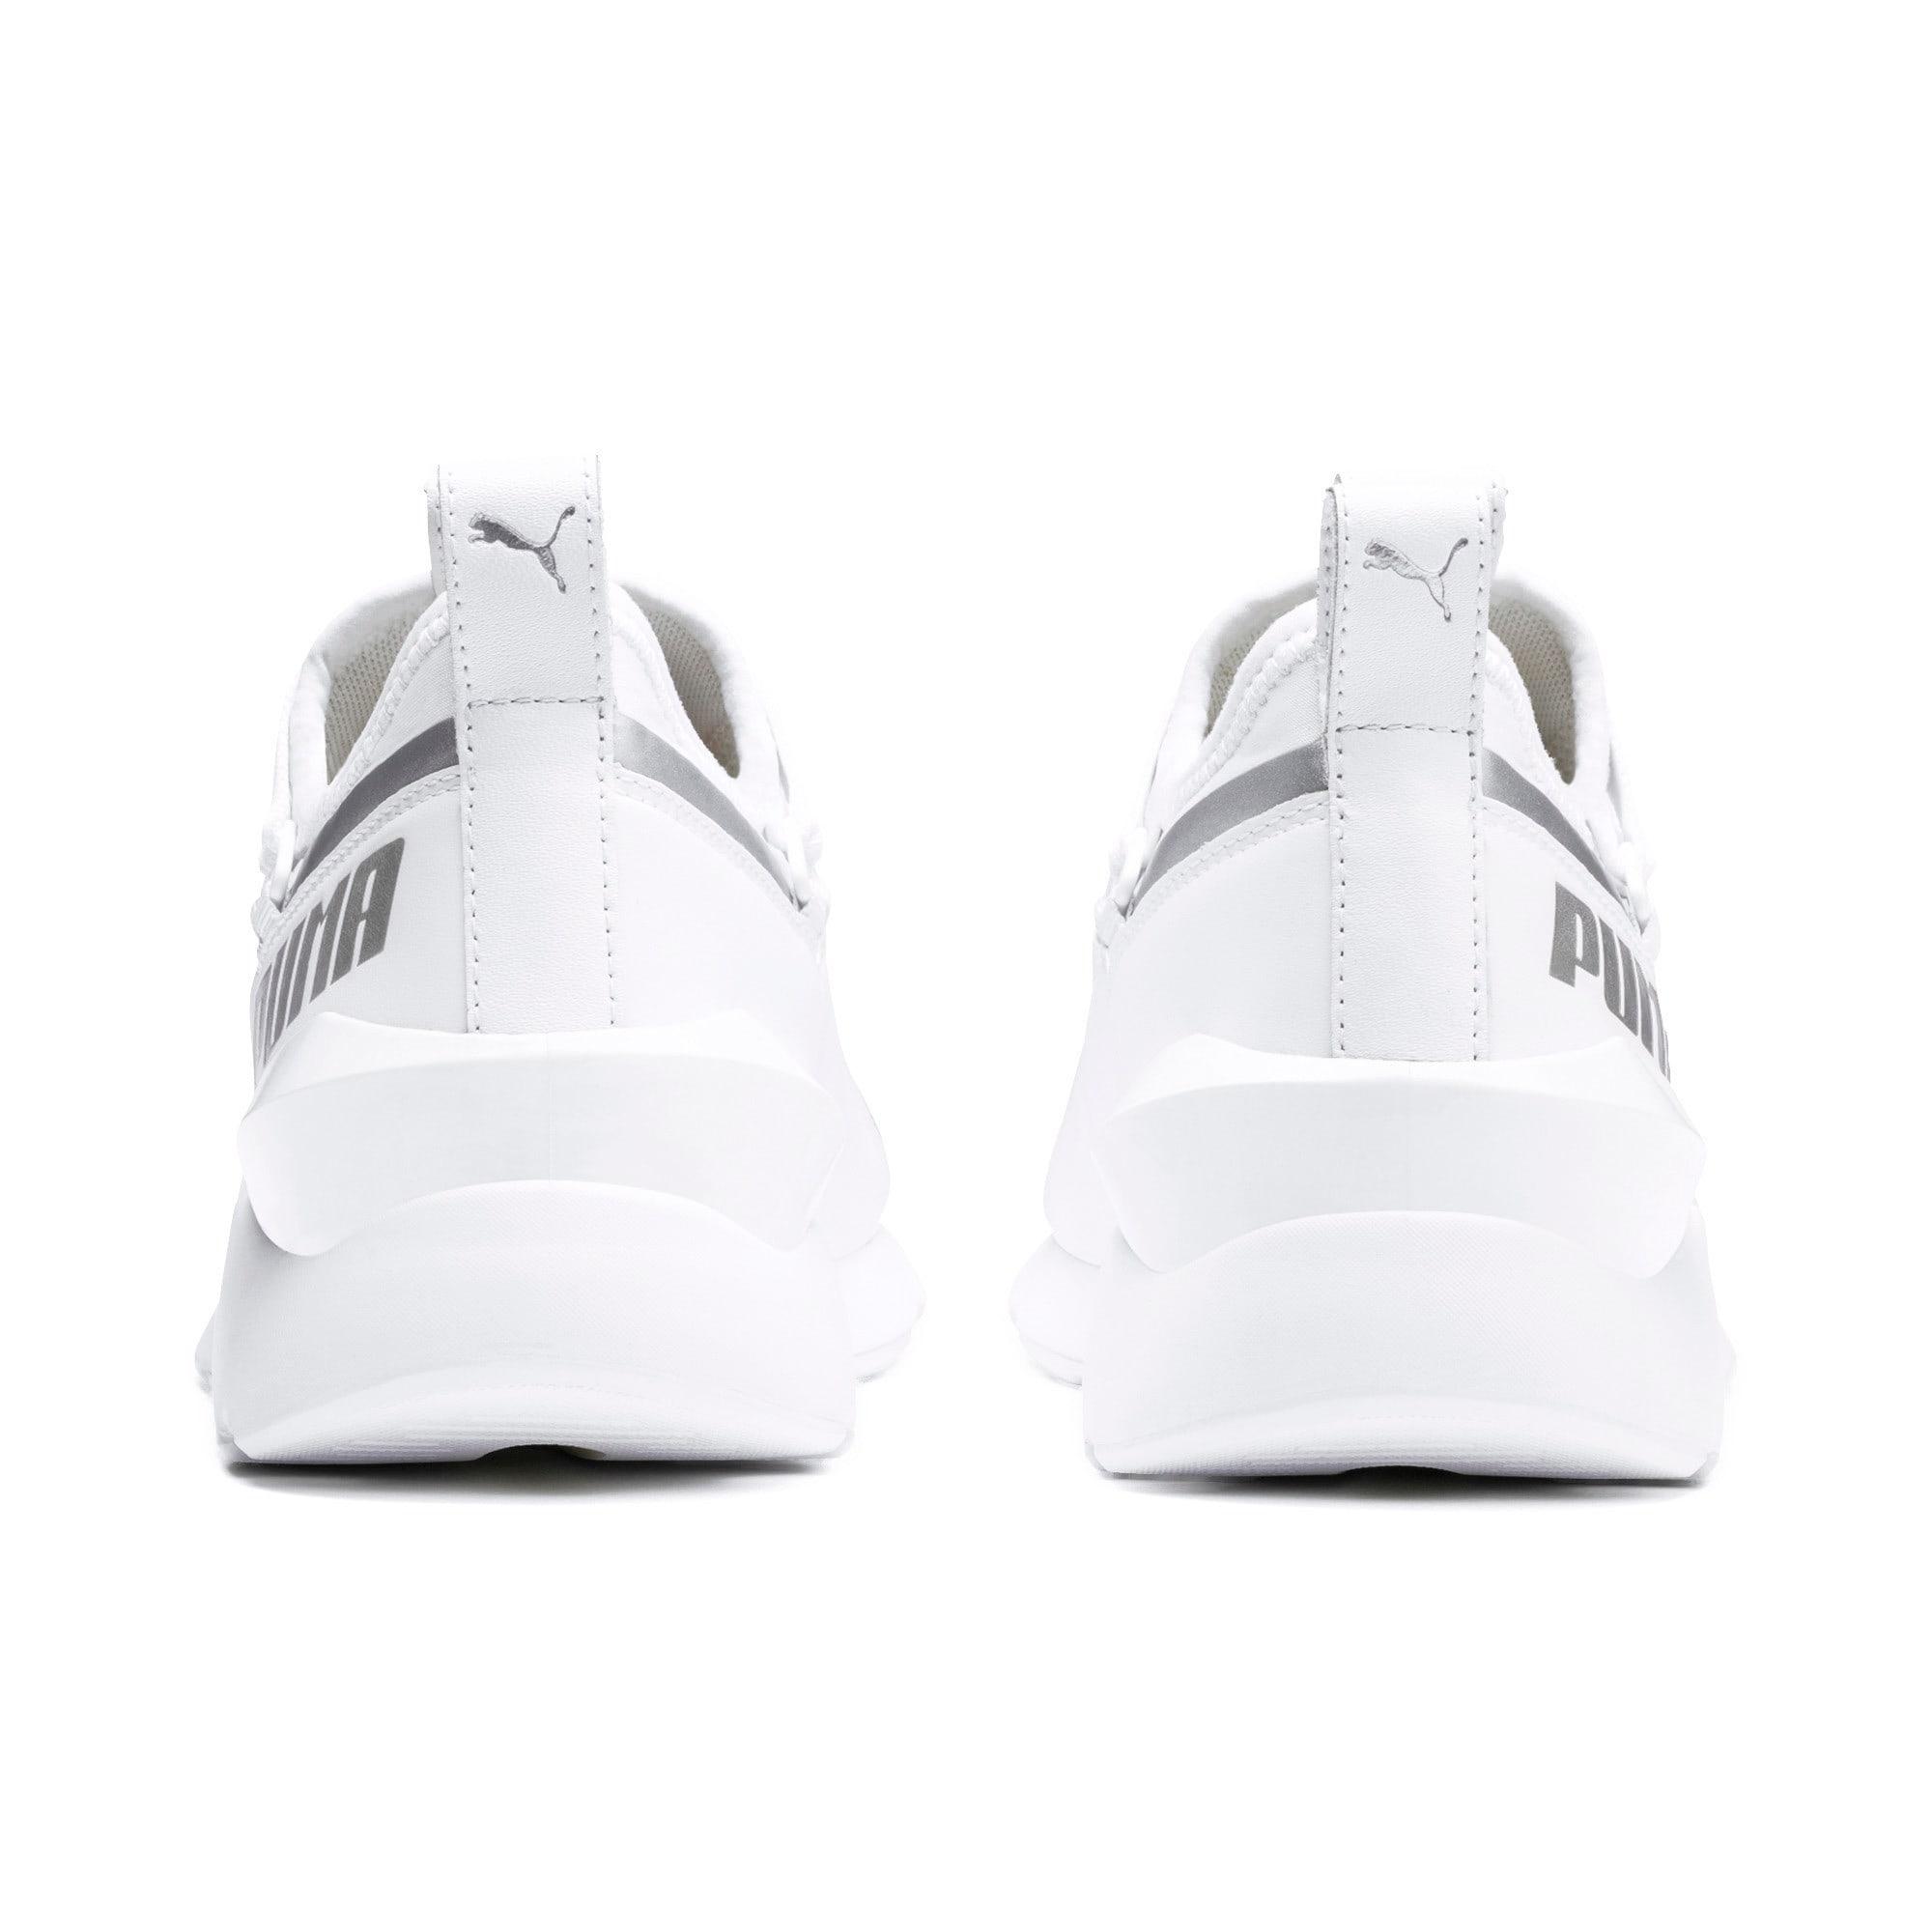 Thumbnail 4 of Muse 2 Trailblazer Women's Sneakers, Puma White-Puma Silver, medium